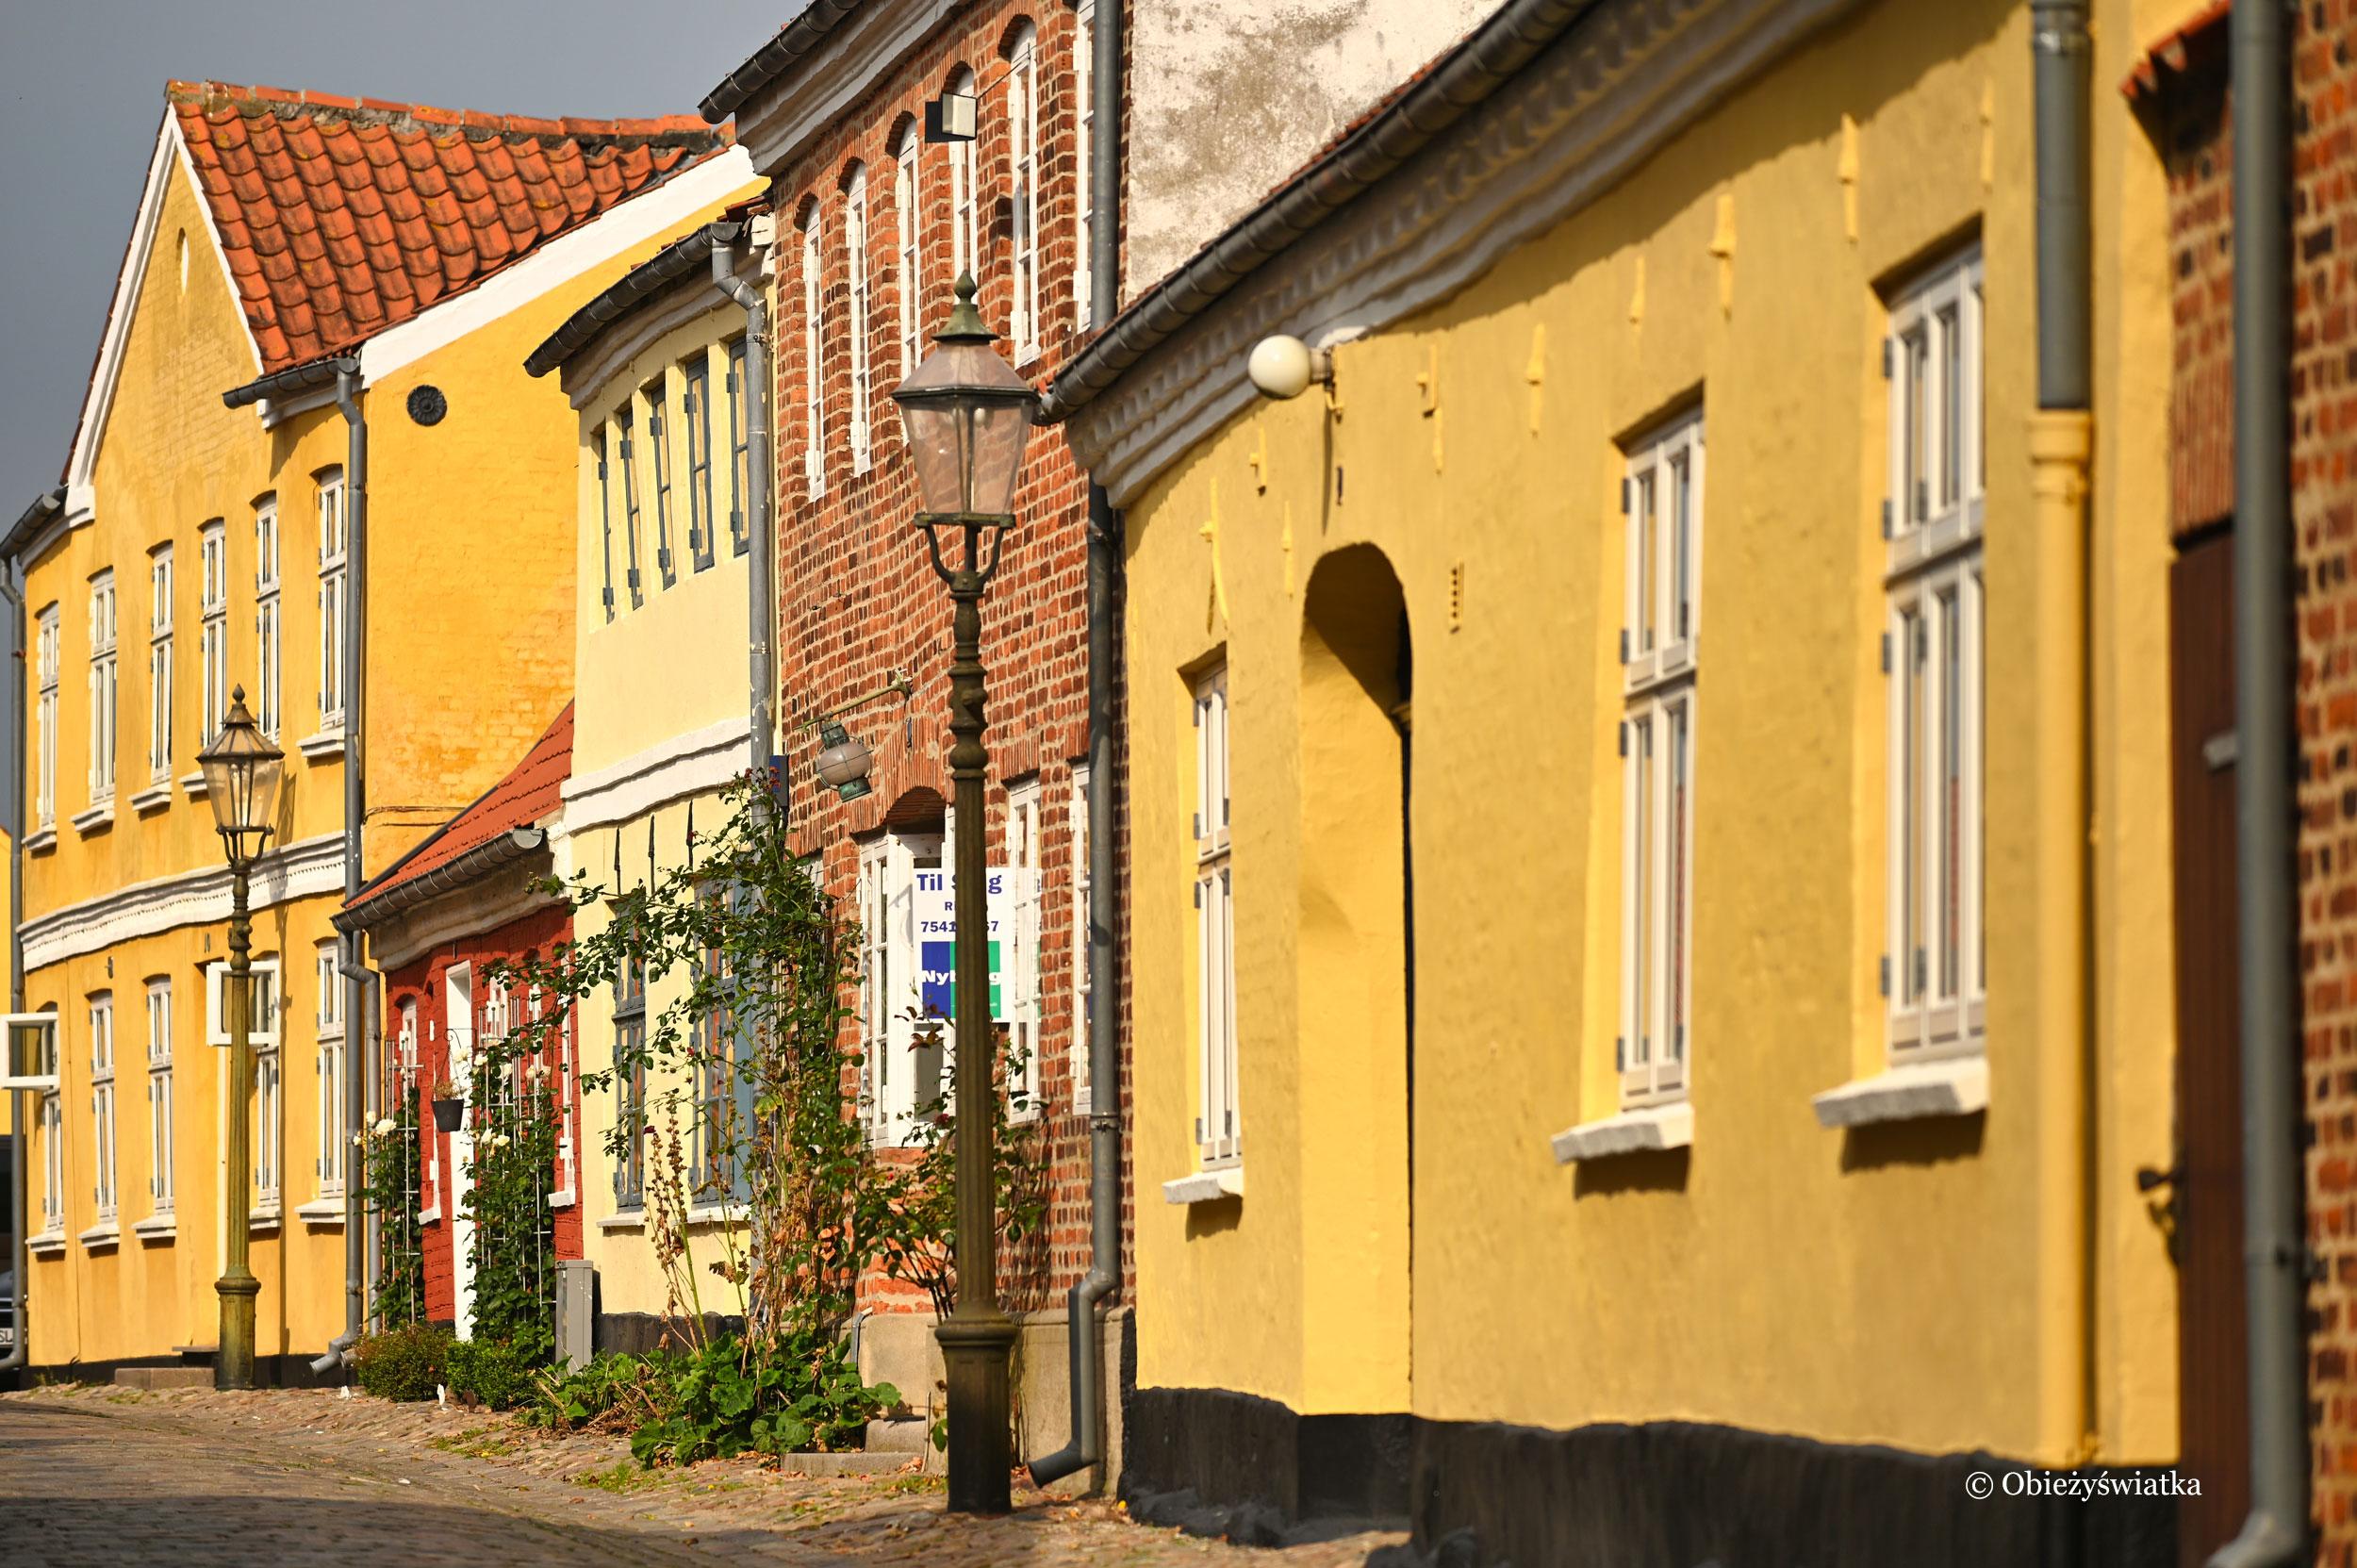 Kolorowa zabudowa w Ribe, Dania